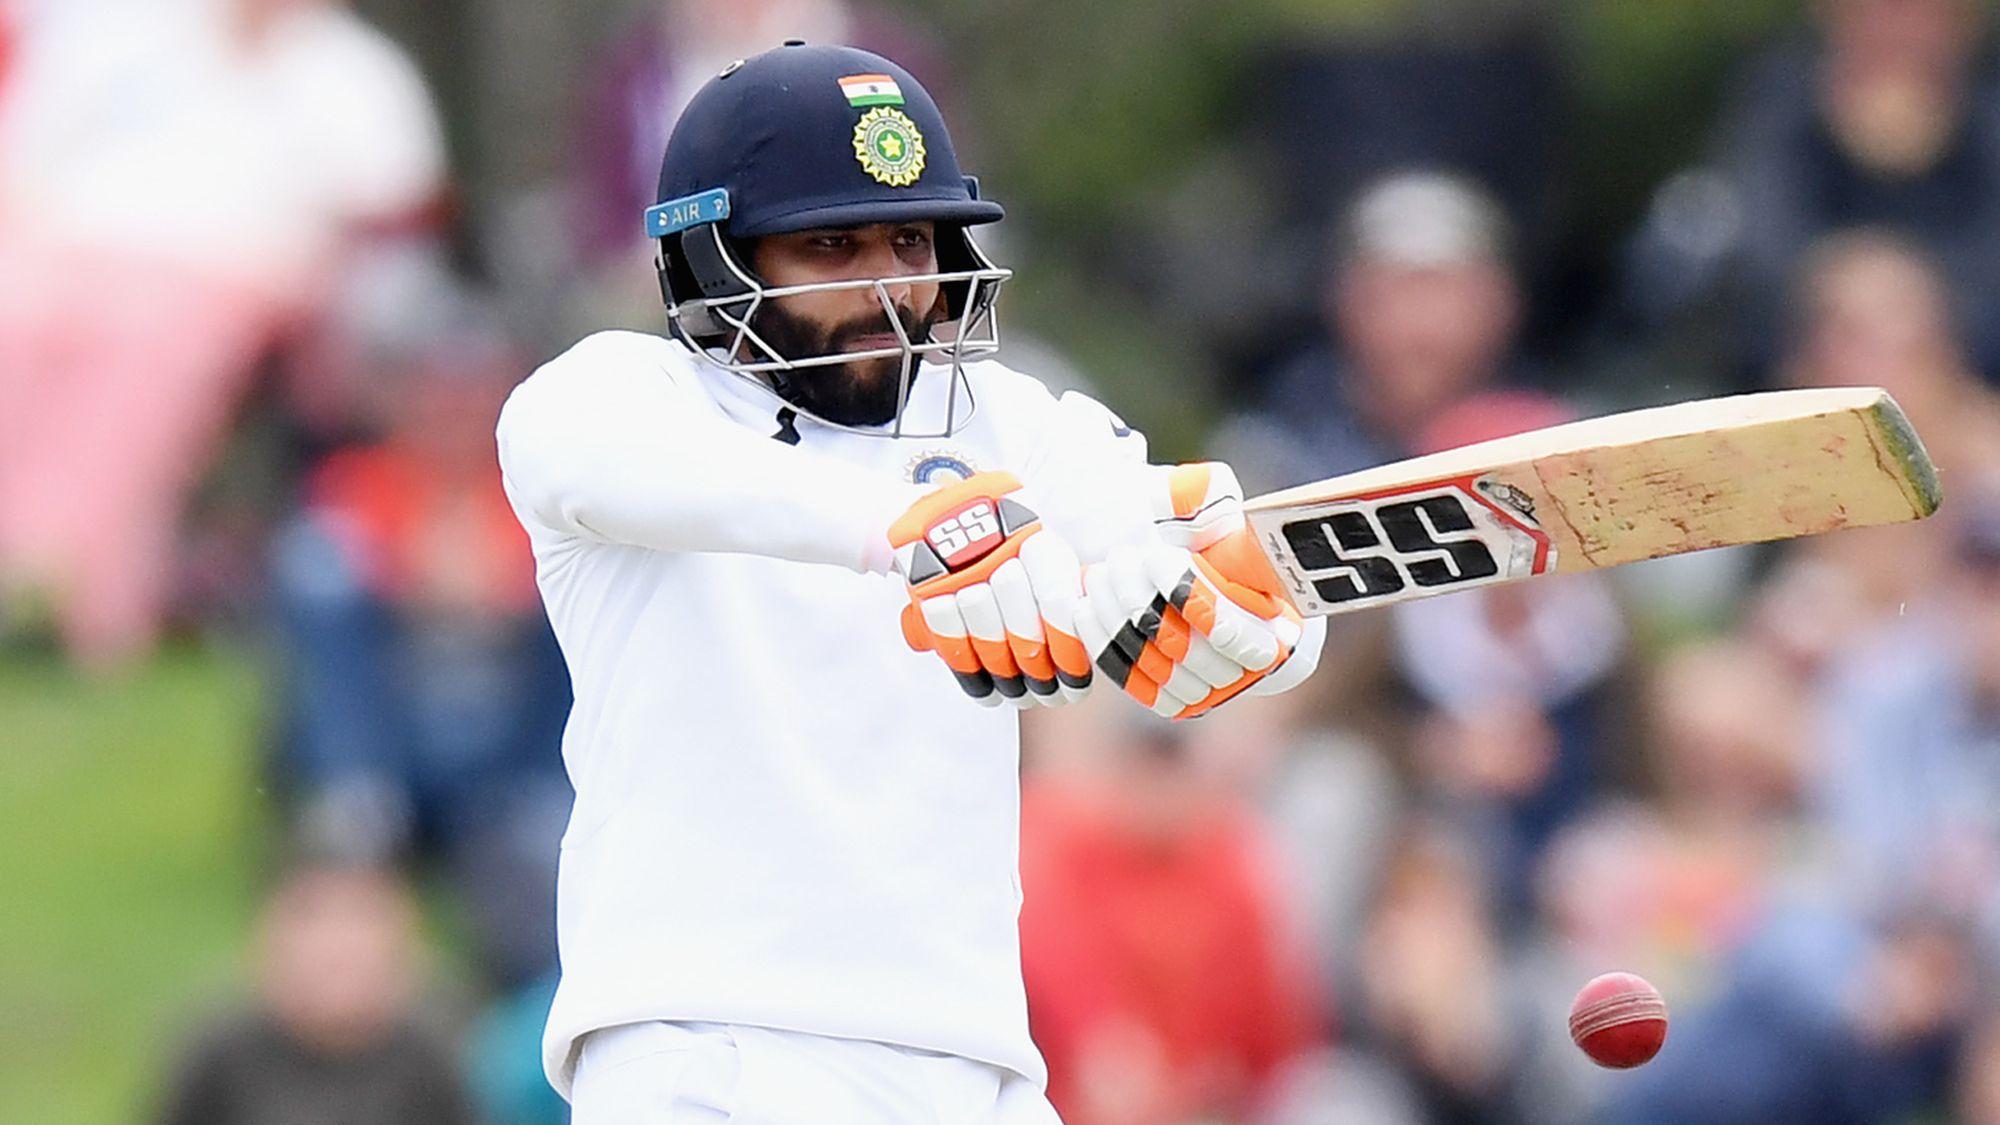 Gun Indian all-rounder Ravi Jadeja firming for Boxing Day Test return, says report